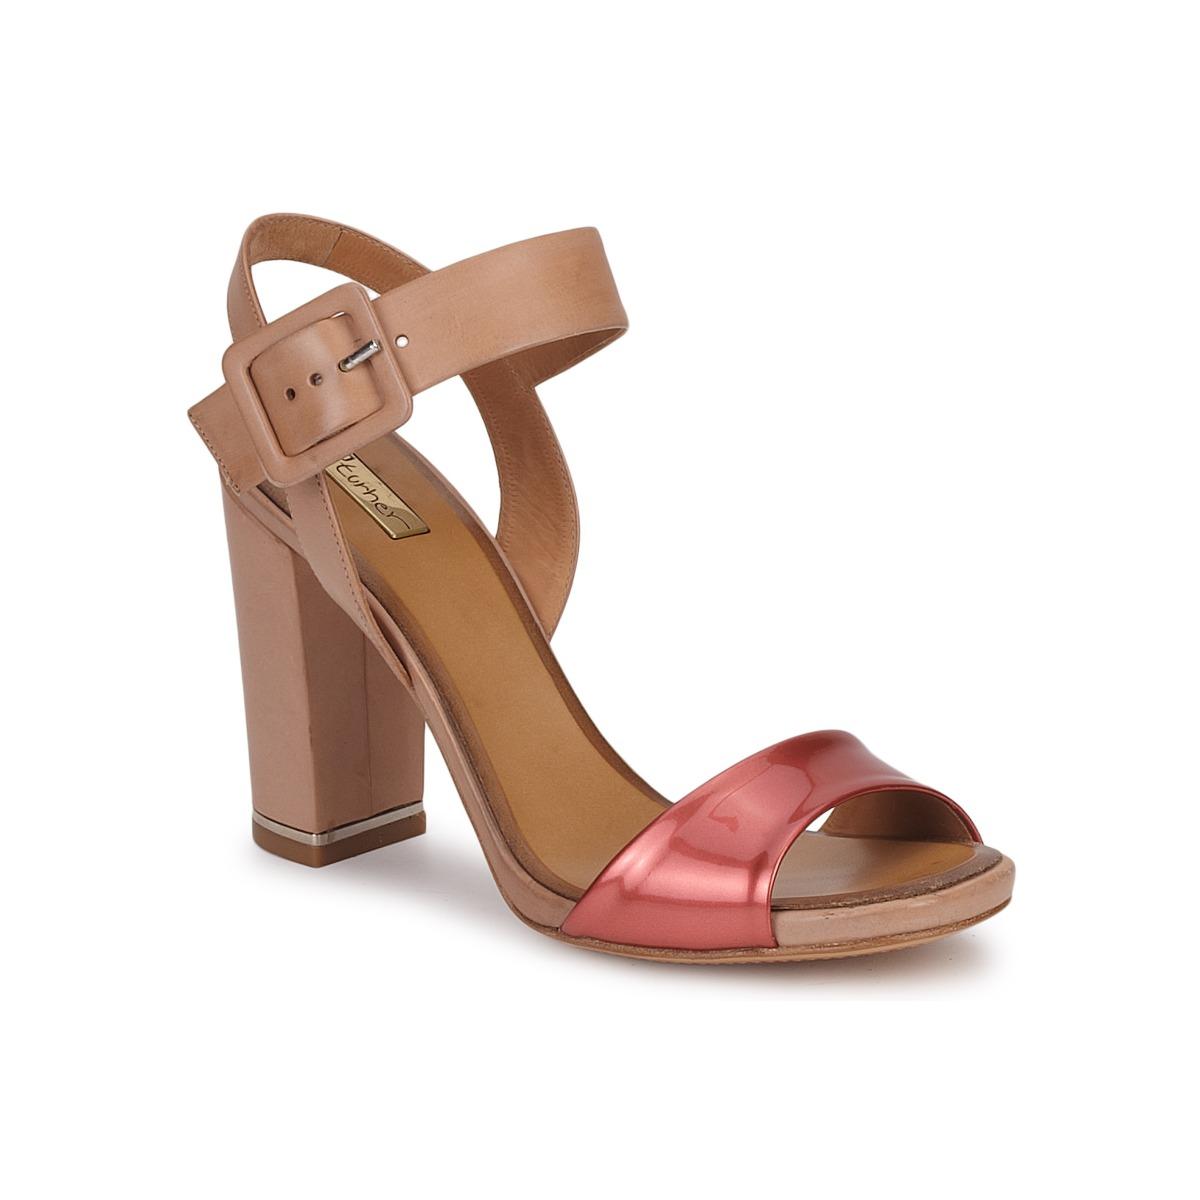 Eva Turner  Bronze / Rot - Kostenloser Versand bei Spartoode ! - Schuhe Sandalen / Sandaletten Damen 180,50 €